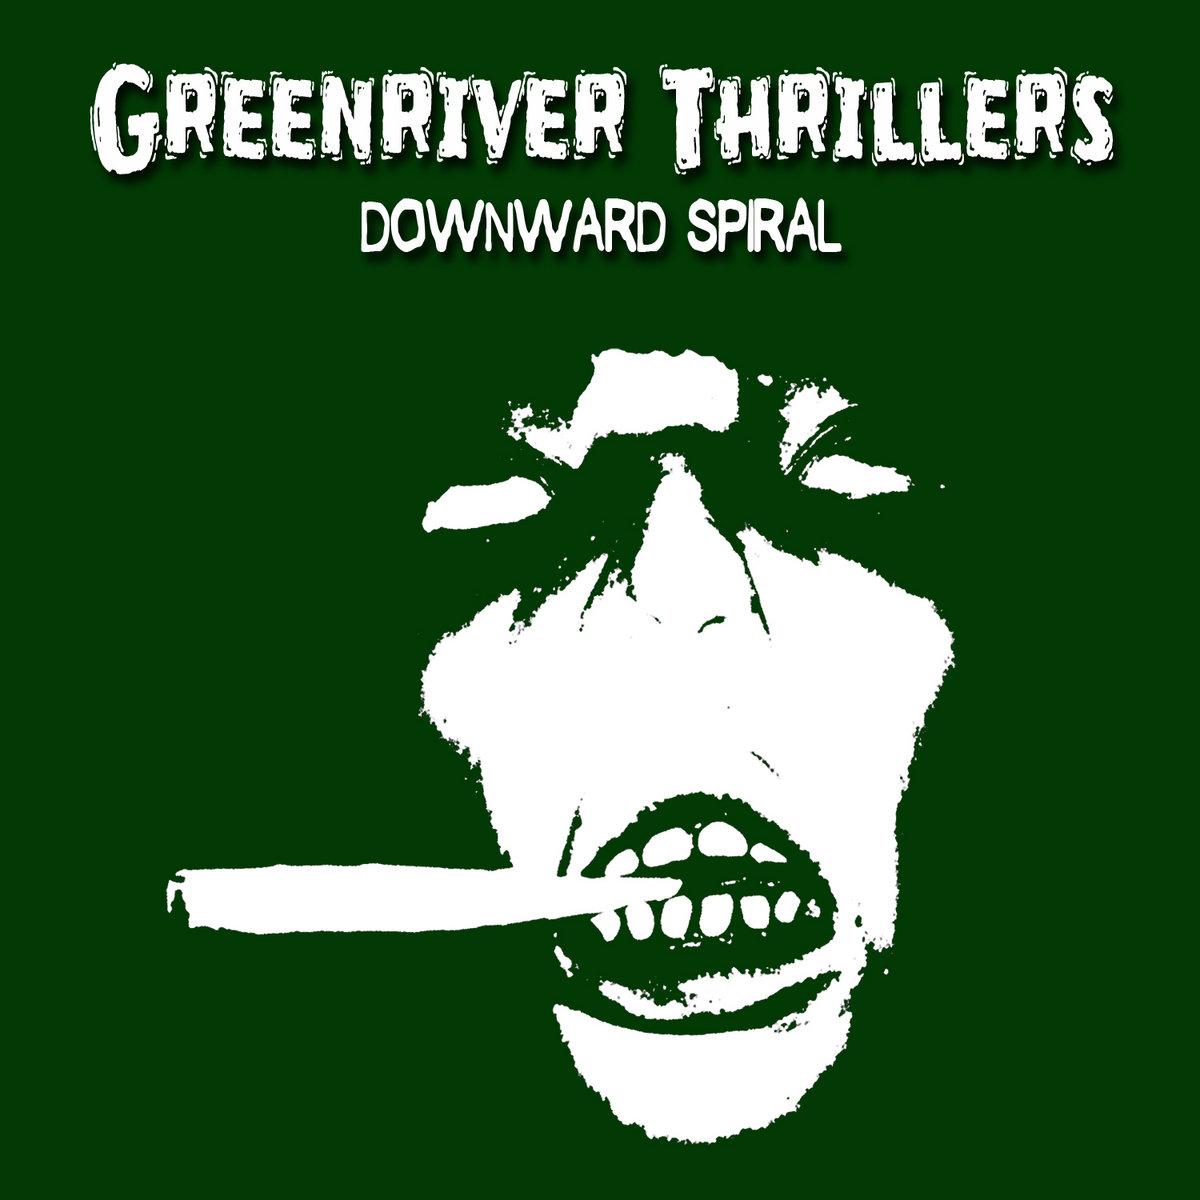 Downward Spiral by Greenriver Thrillers